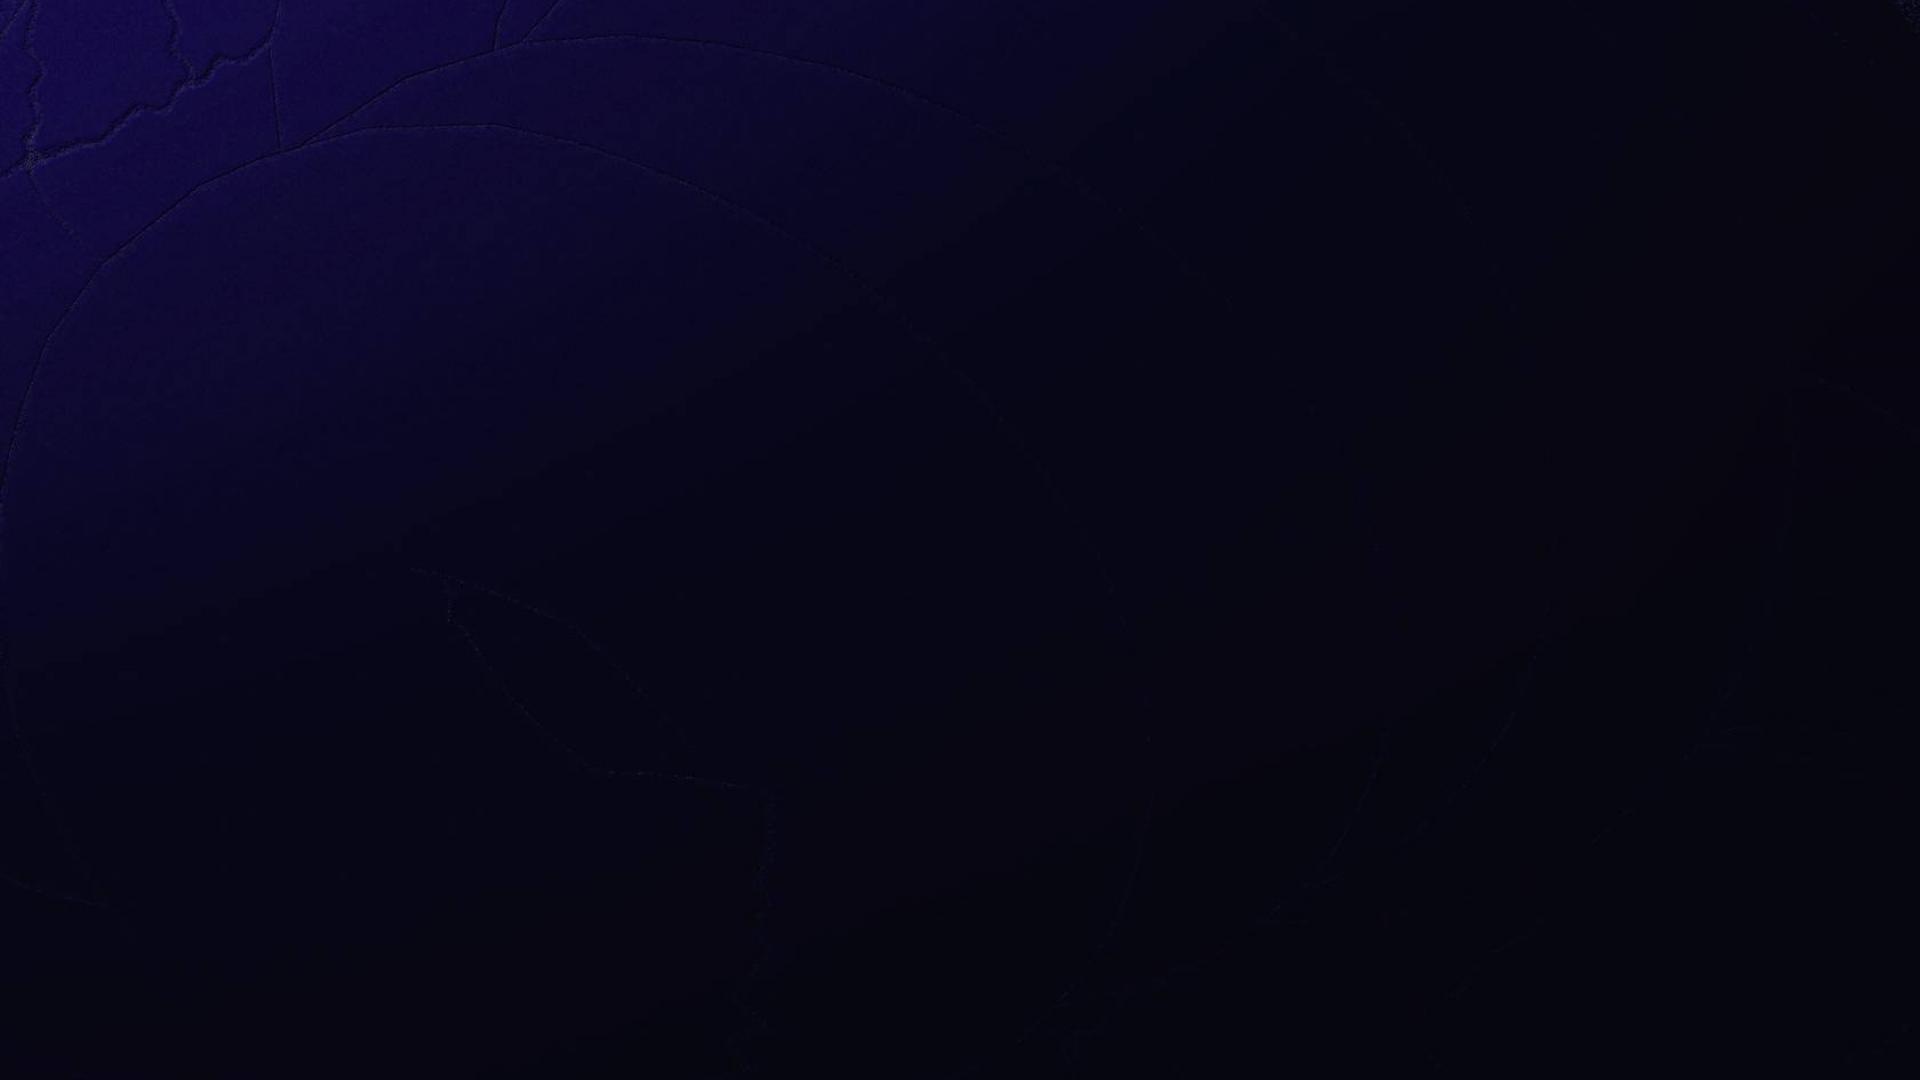 <b>Dark Blue</b> Curtain <b>HD</